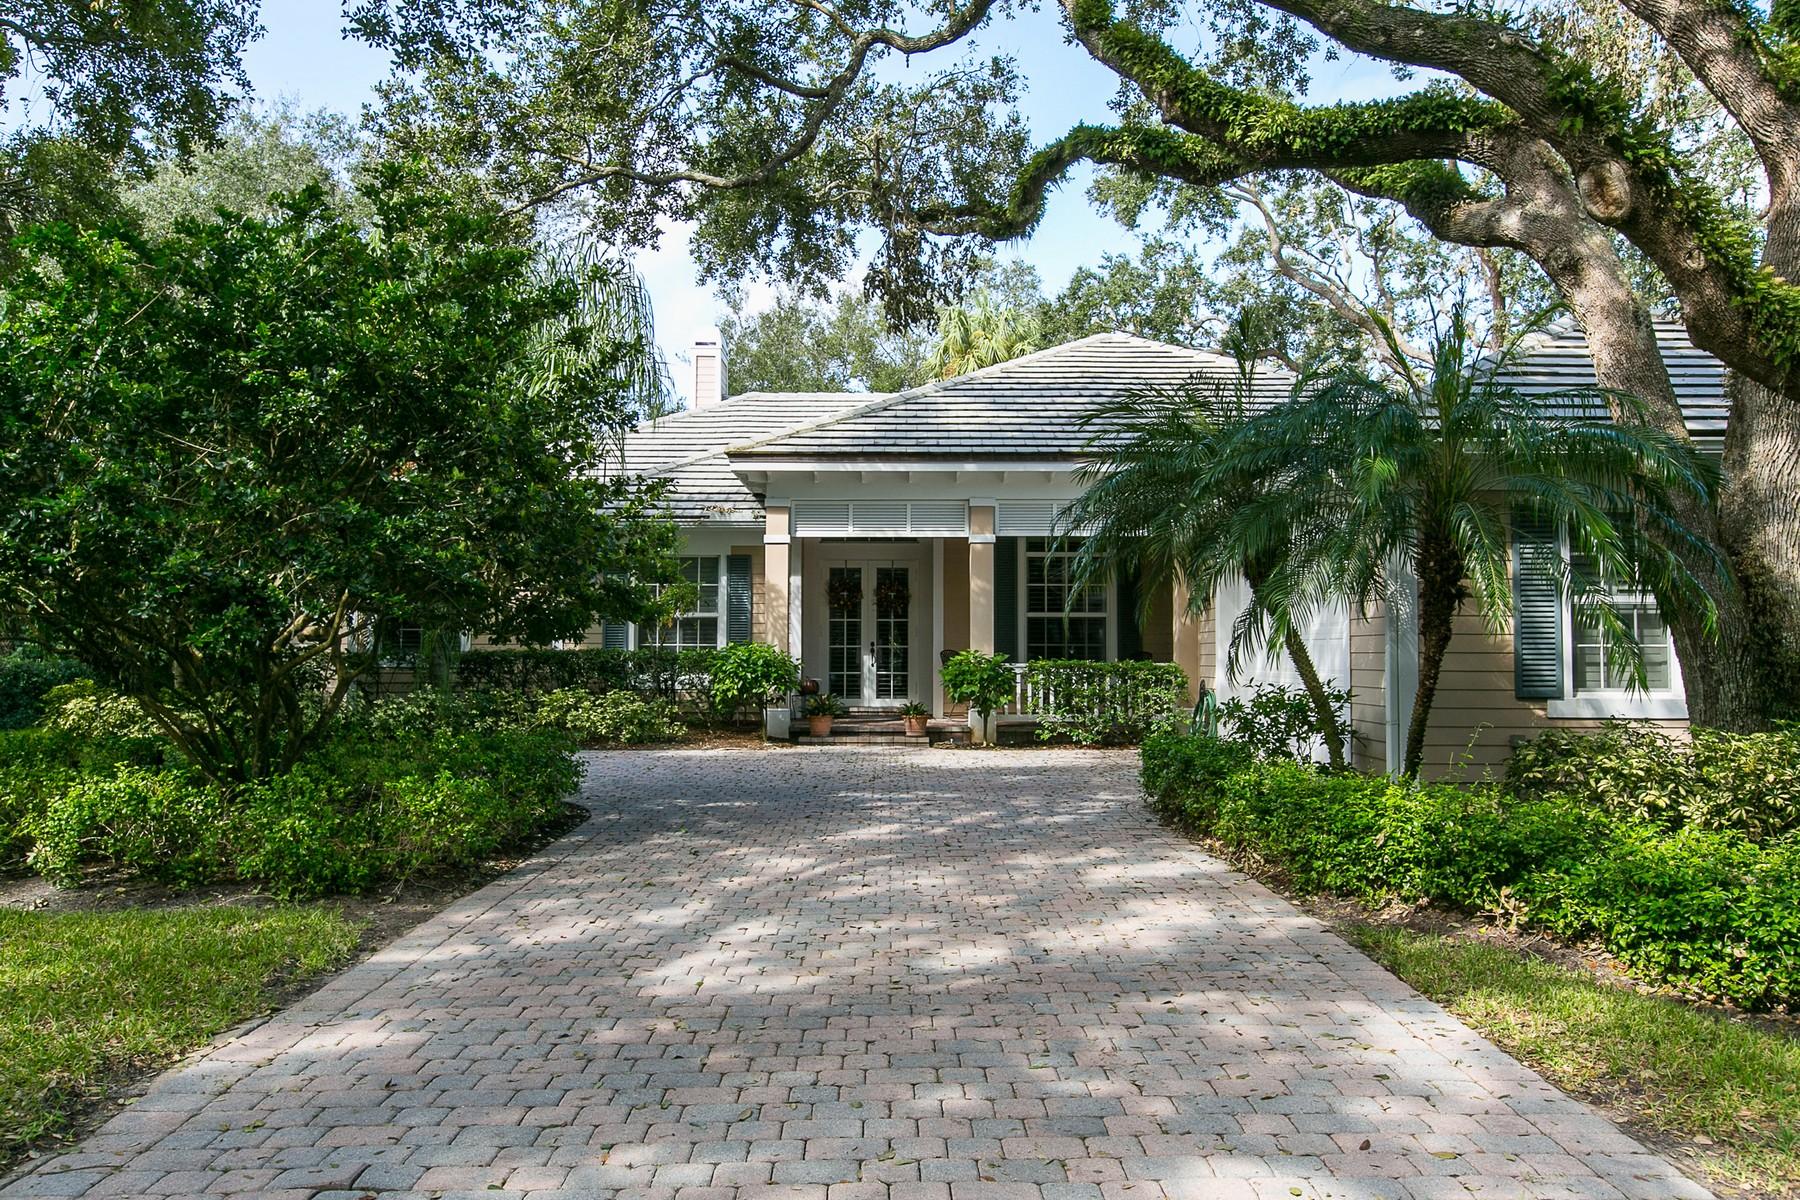 Moradia para Venda às Elegant Custom Home in Indian Trails 671 N Tomahawk Trl Indian River Shores, Florida, 32963 Estados Unidos